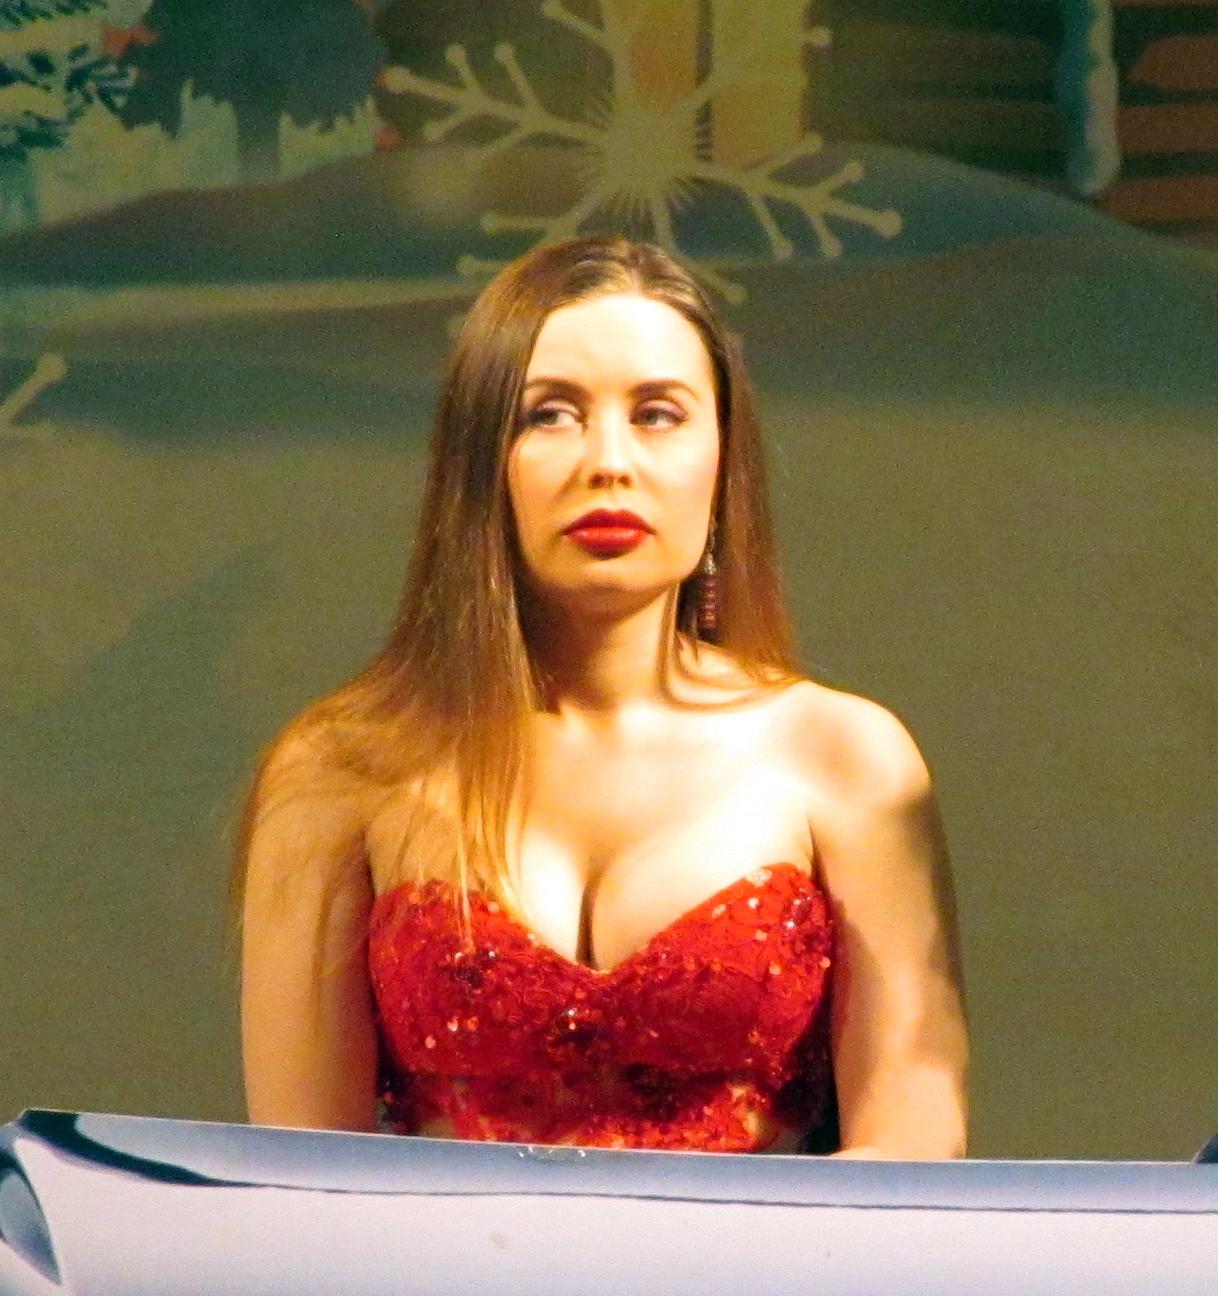 михалкова юлия фото плейбой